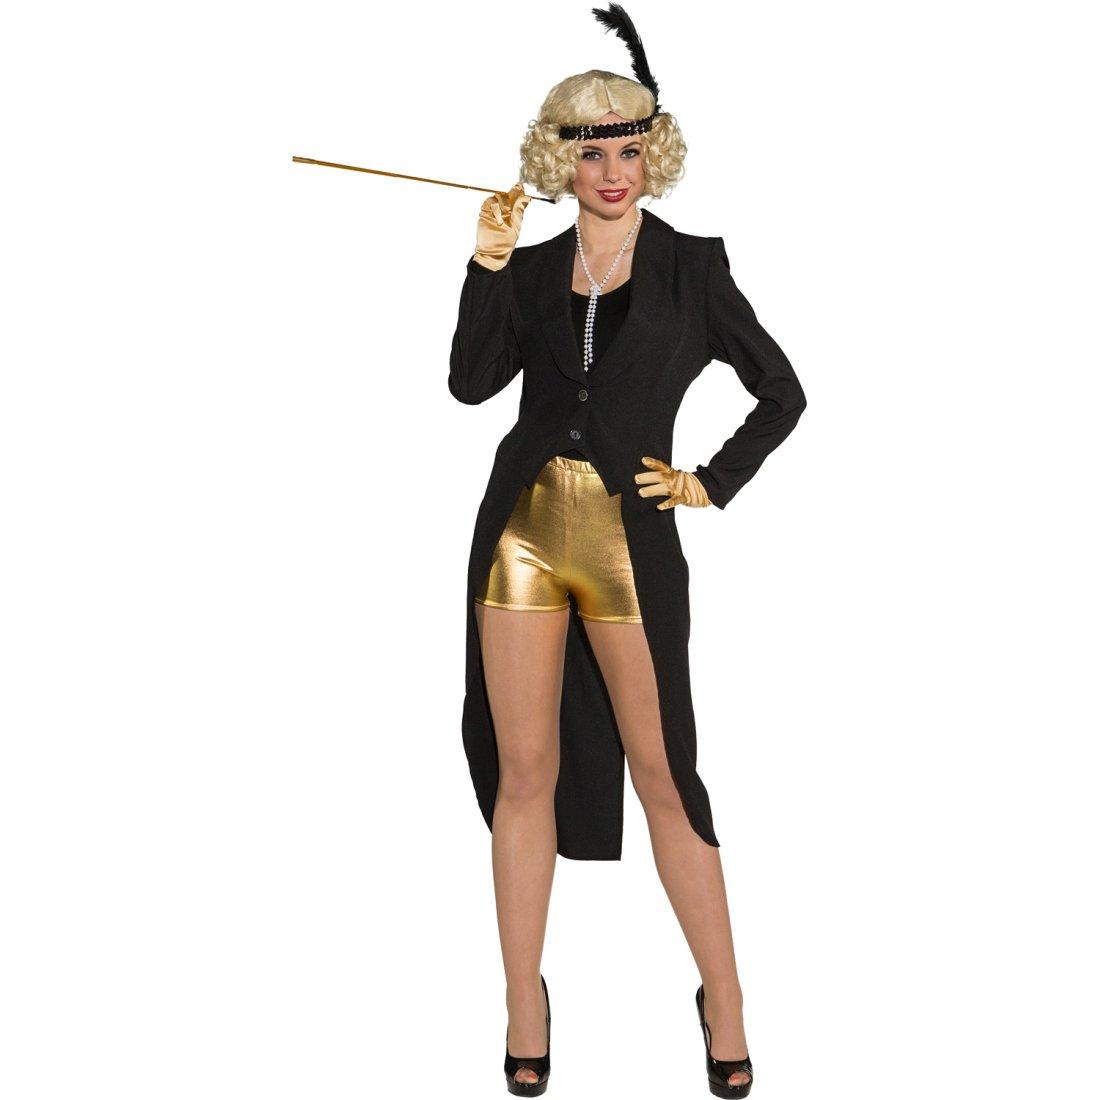 NET TOYS FRAC Mujer Negro FRAC Showgirl L 42/44 Ropa Mujer Cabaret ...